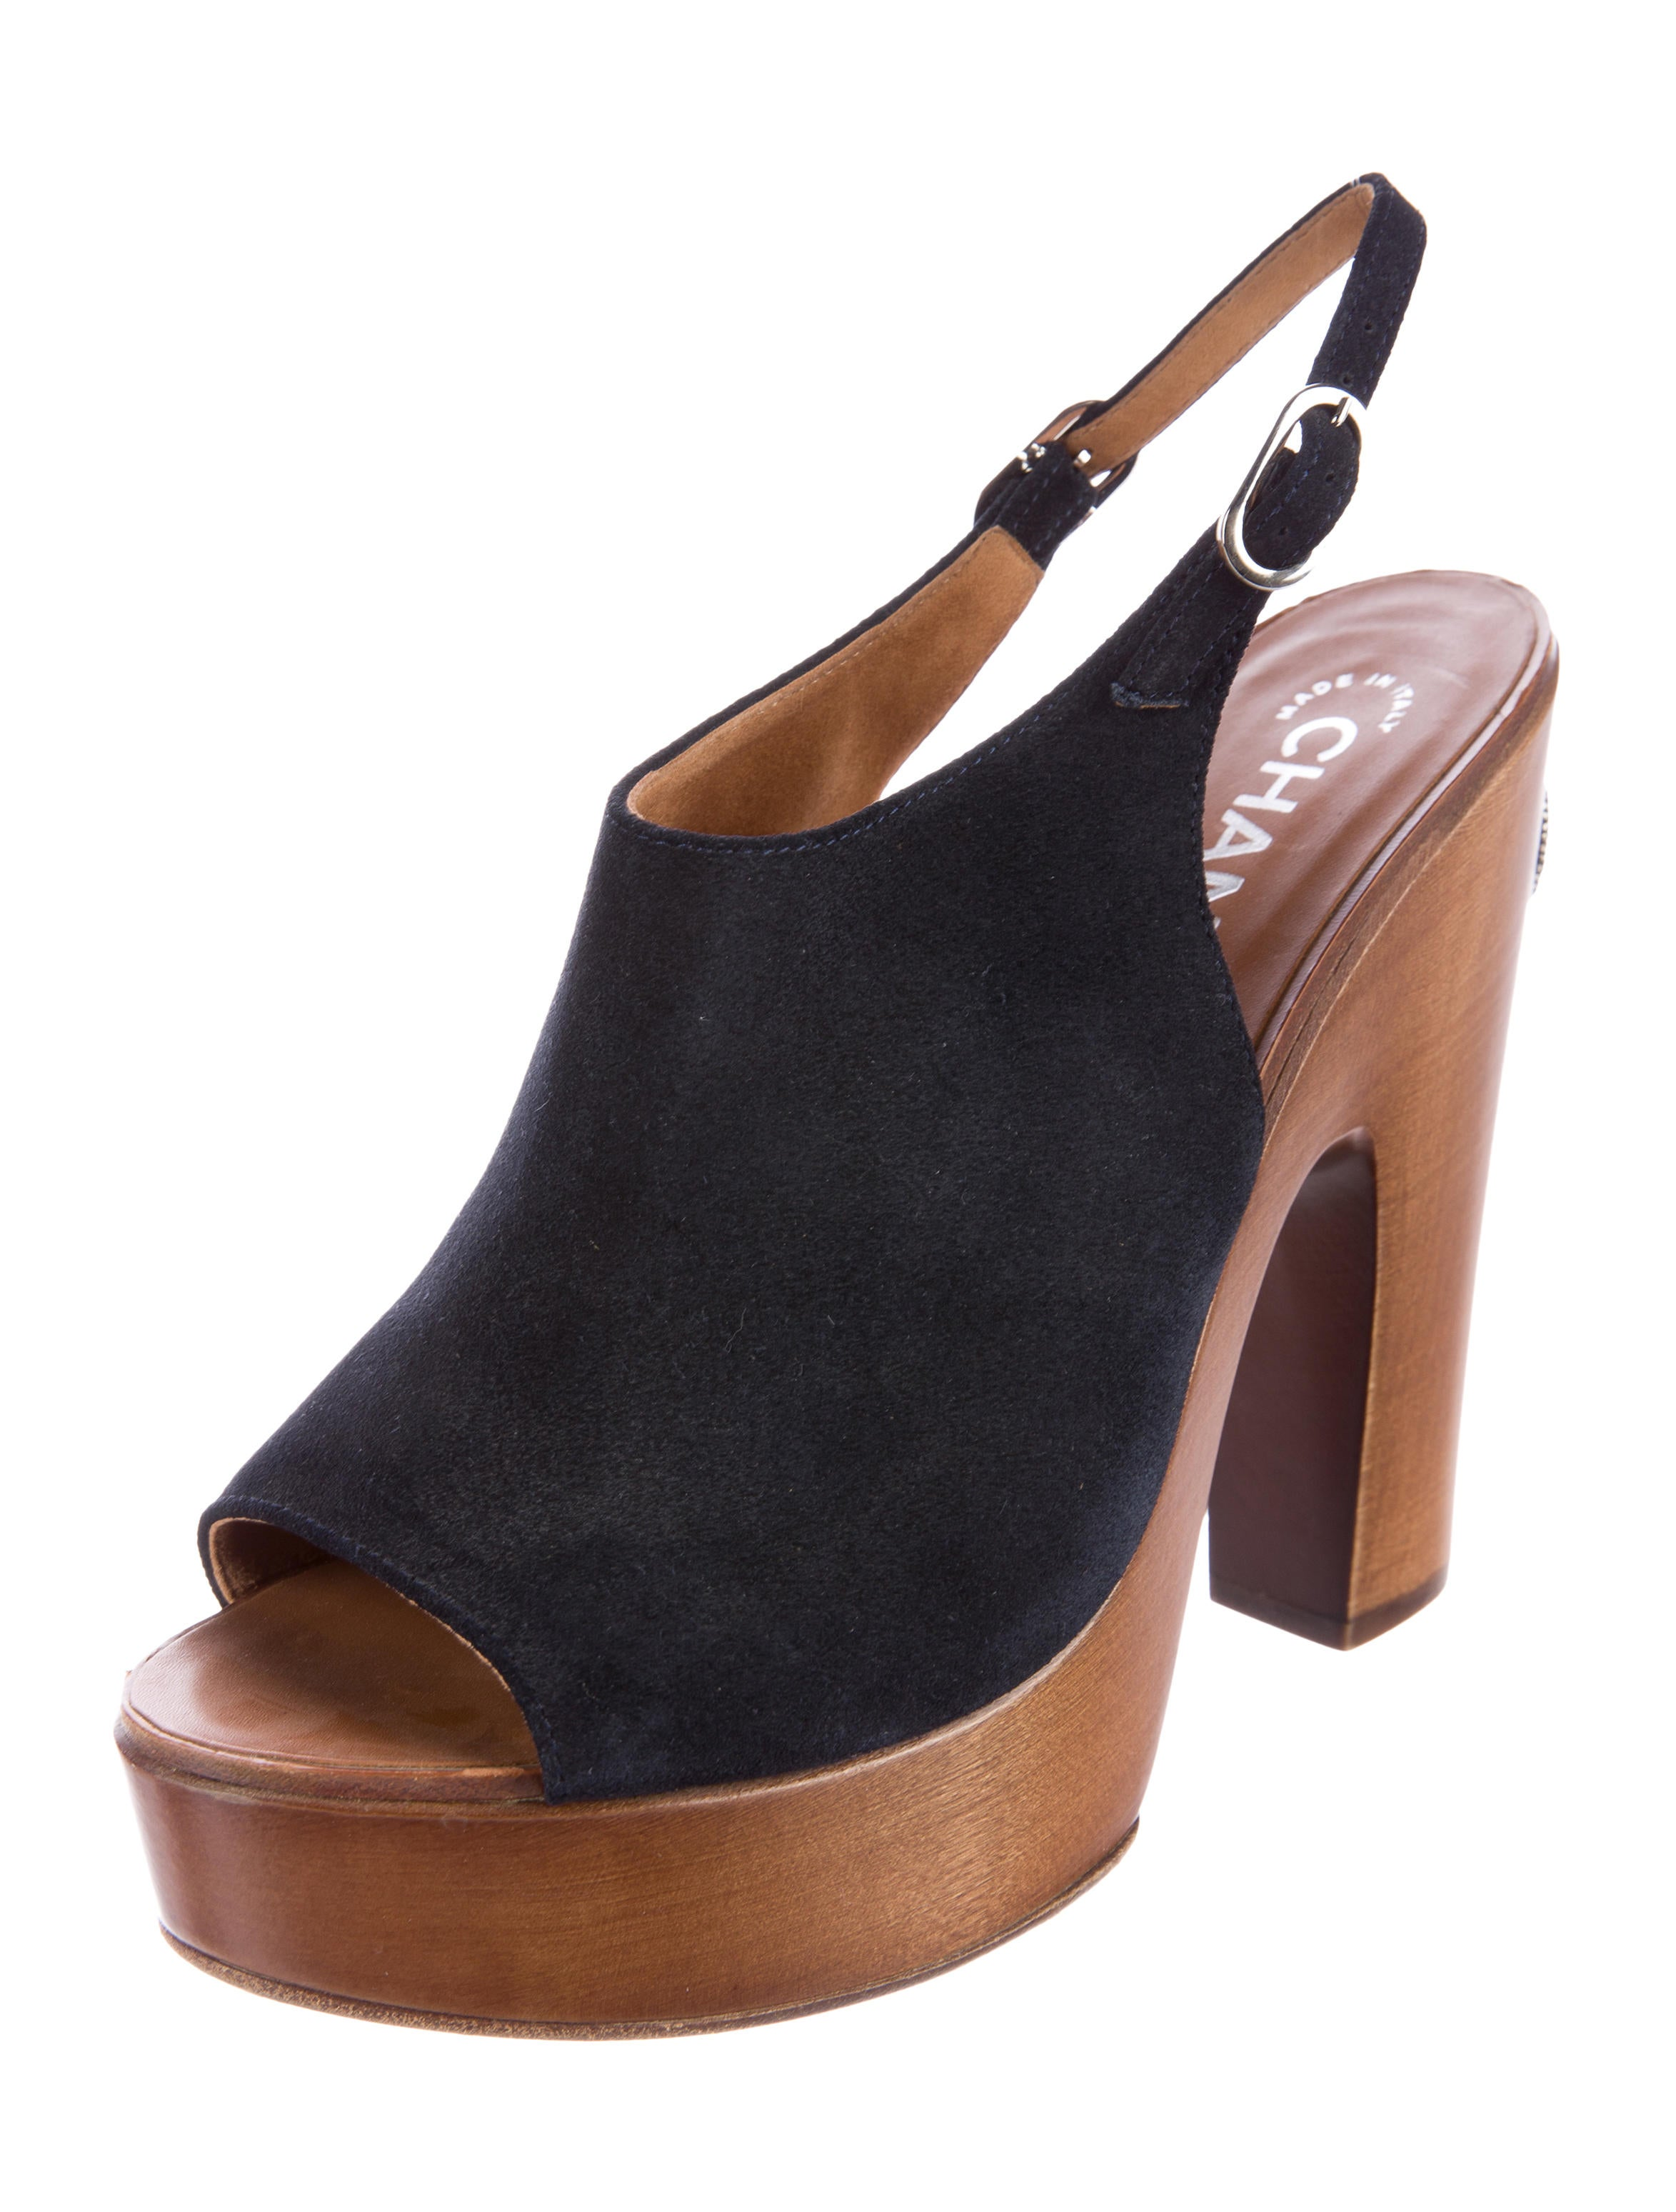 chanel suede platform sandals shoes cha134974 the